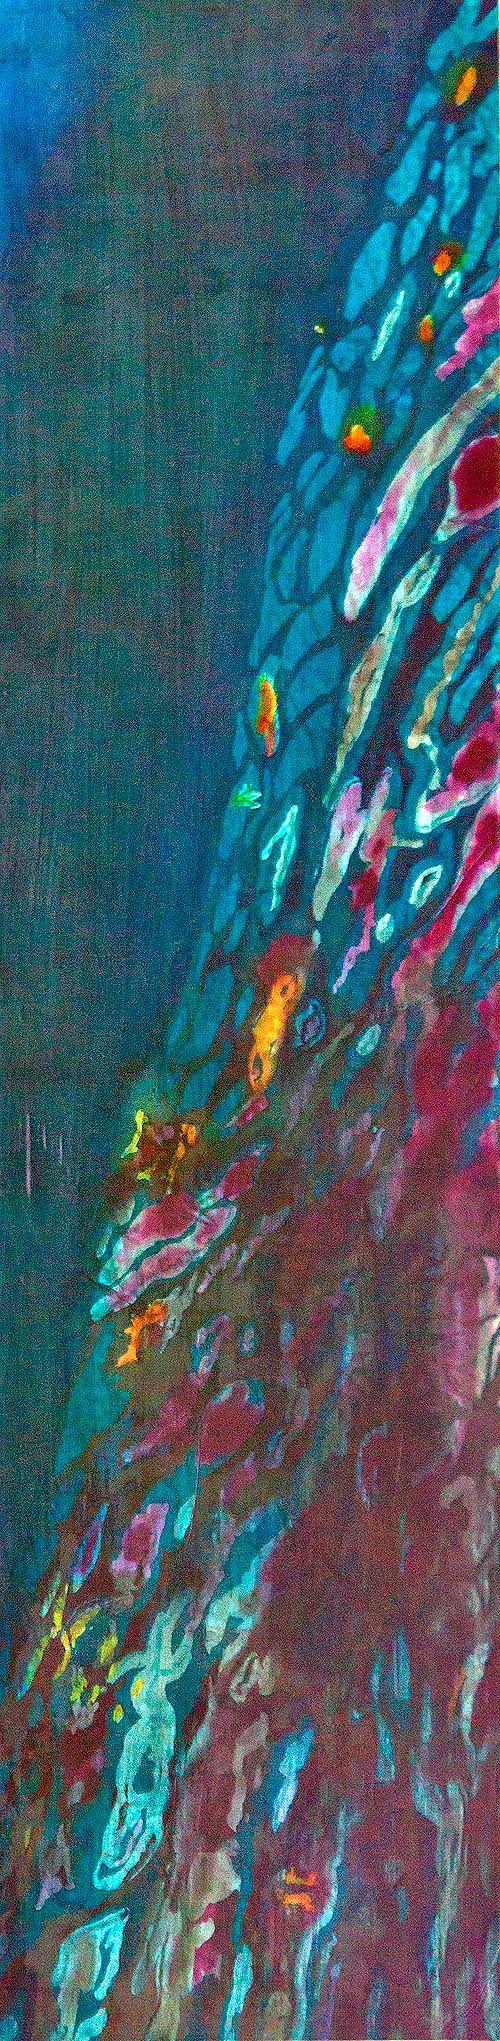 Agua XV: Reflections  mixed media  68 x 16 in